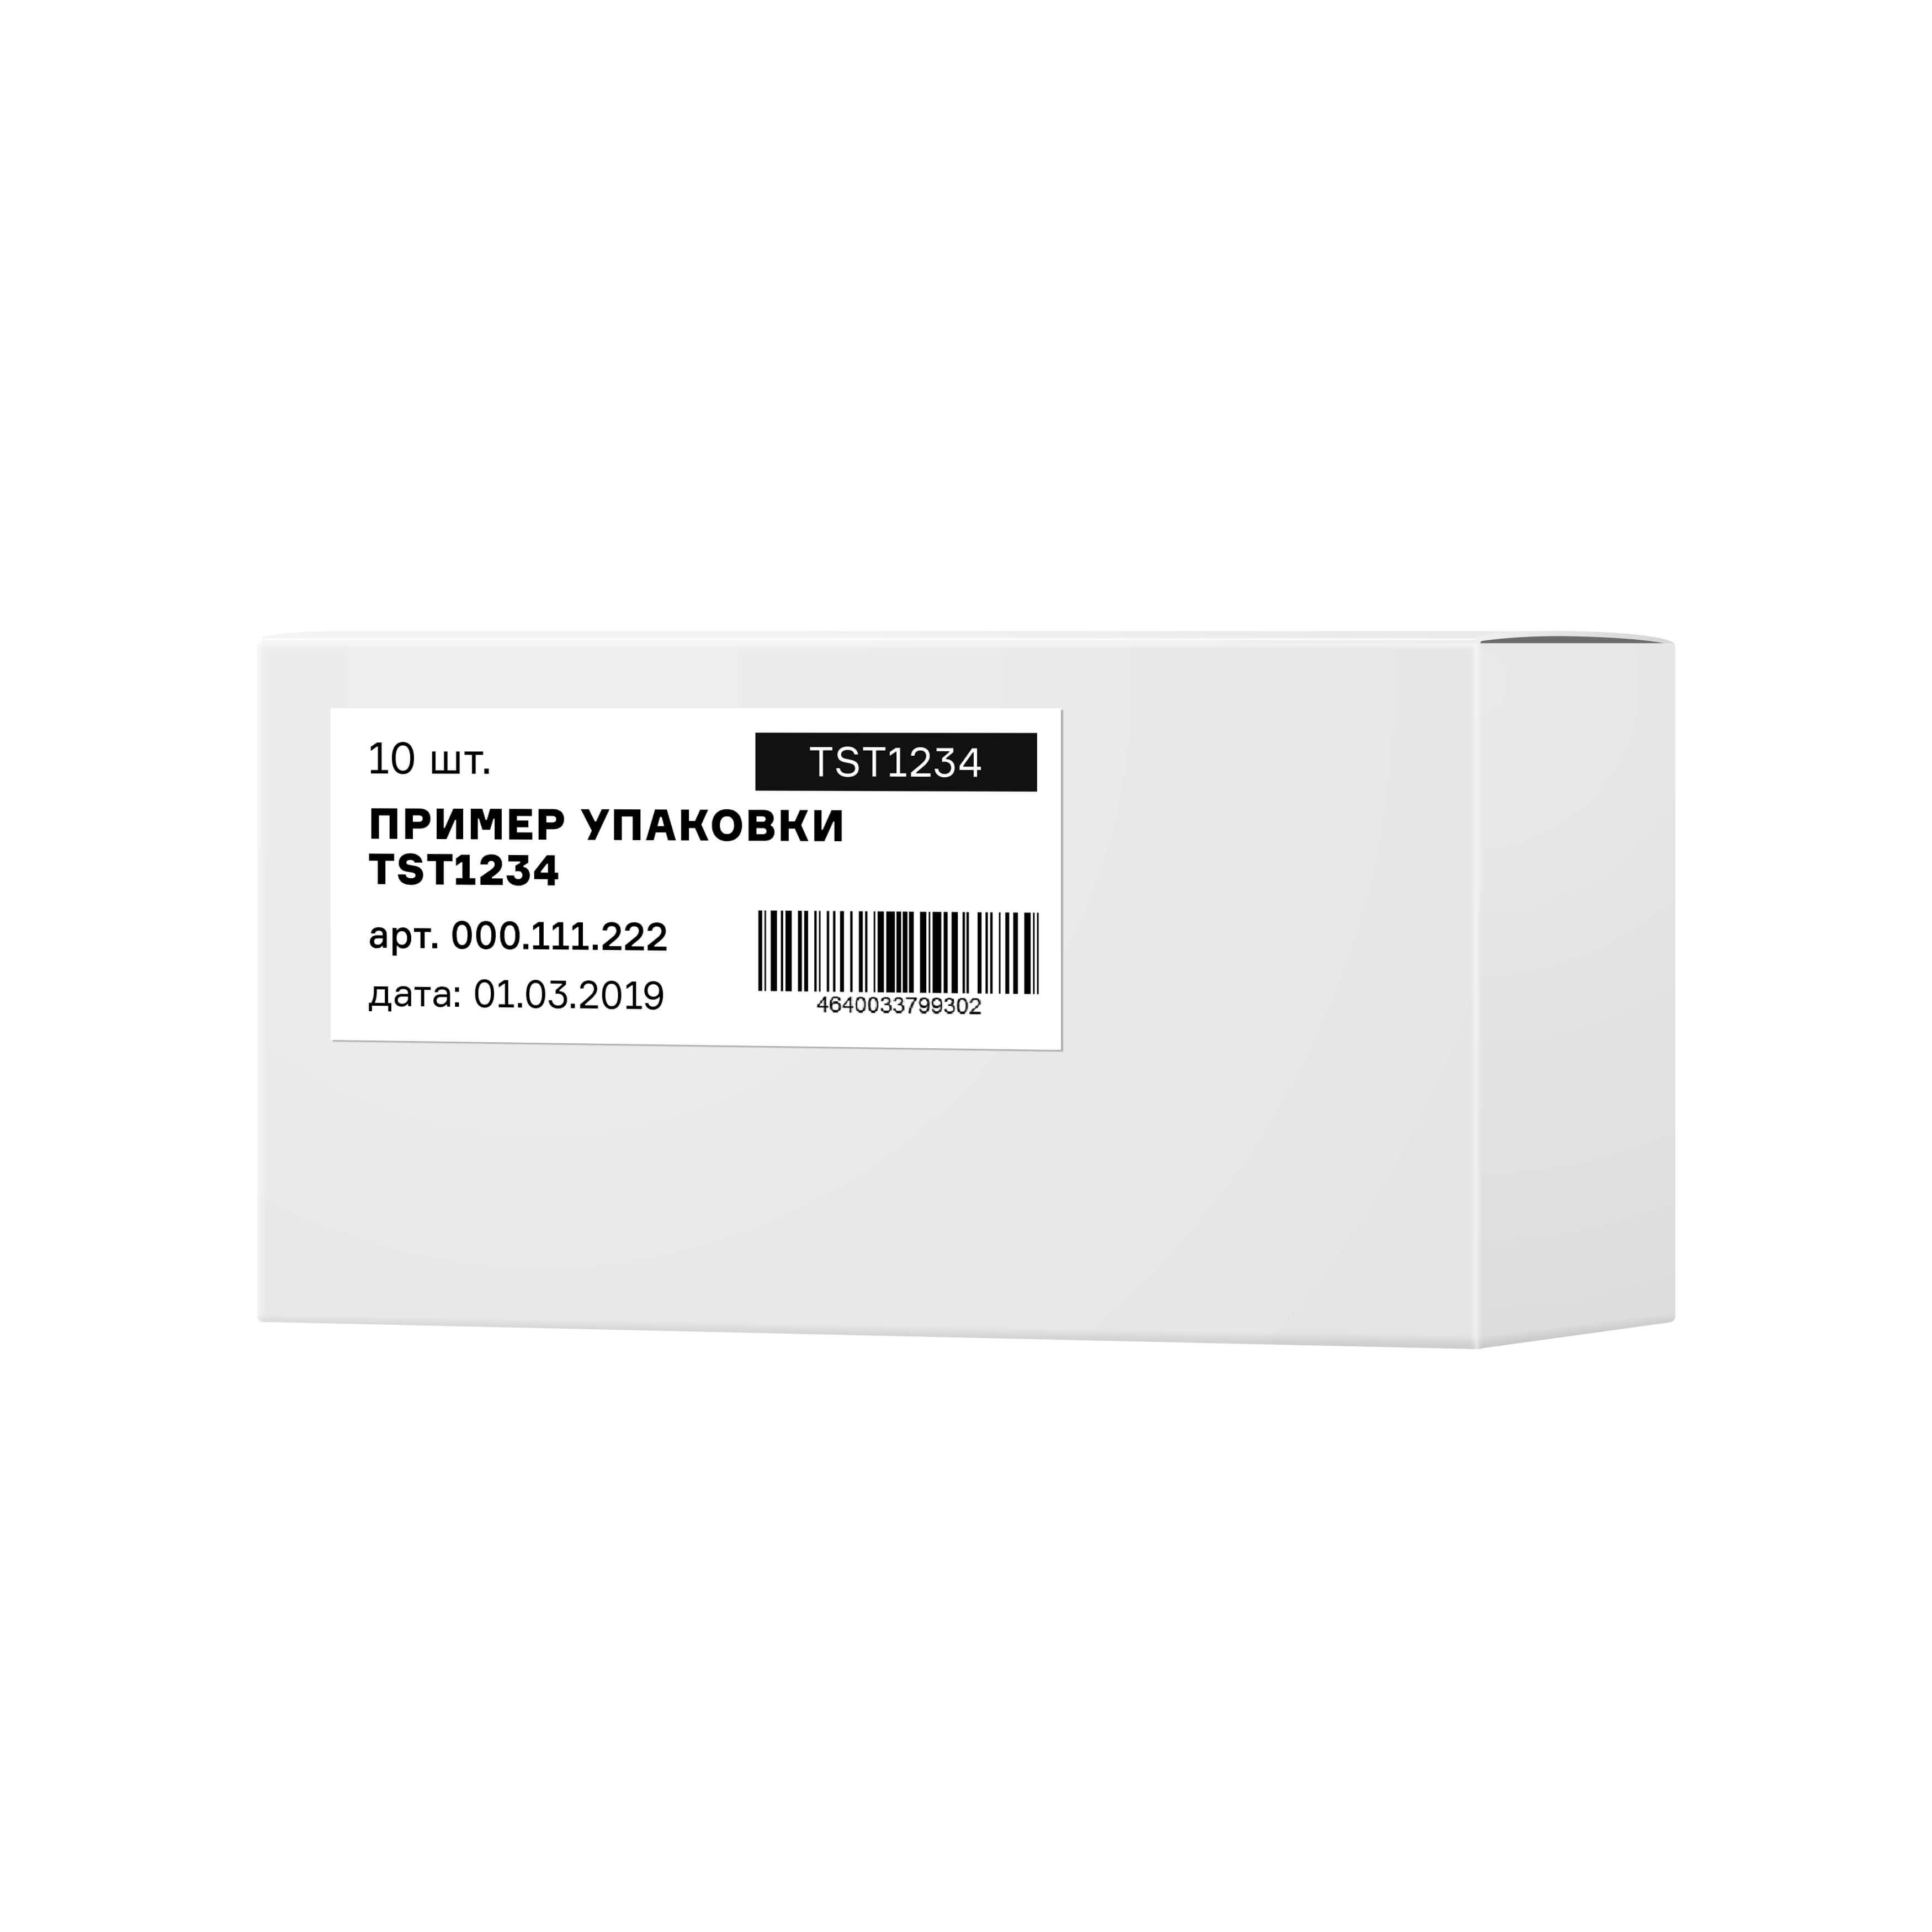 Сопло удл. d8,0мм (TIG TP 17/18/26) № 5L IPT1713